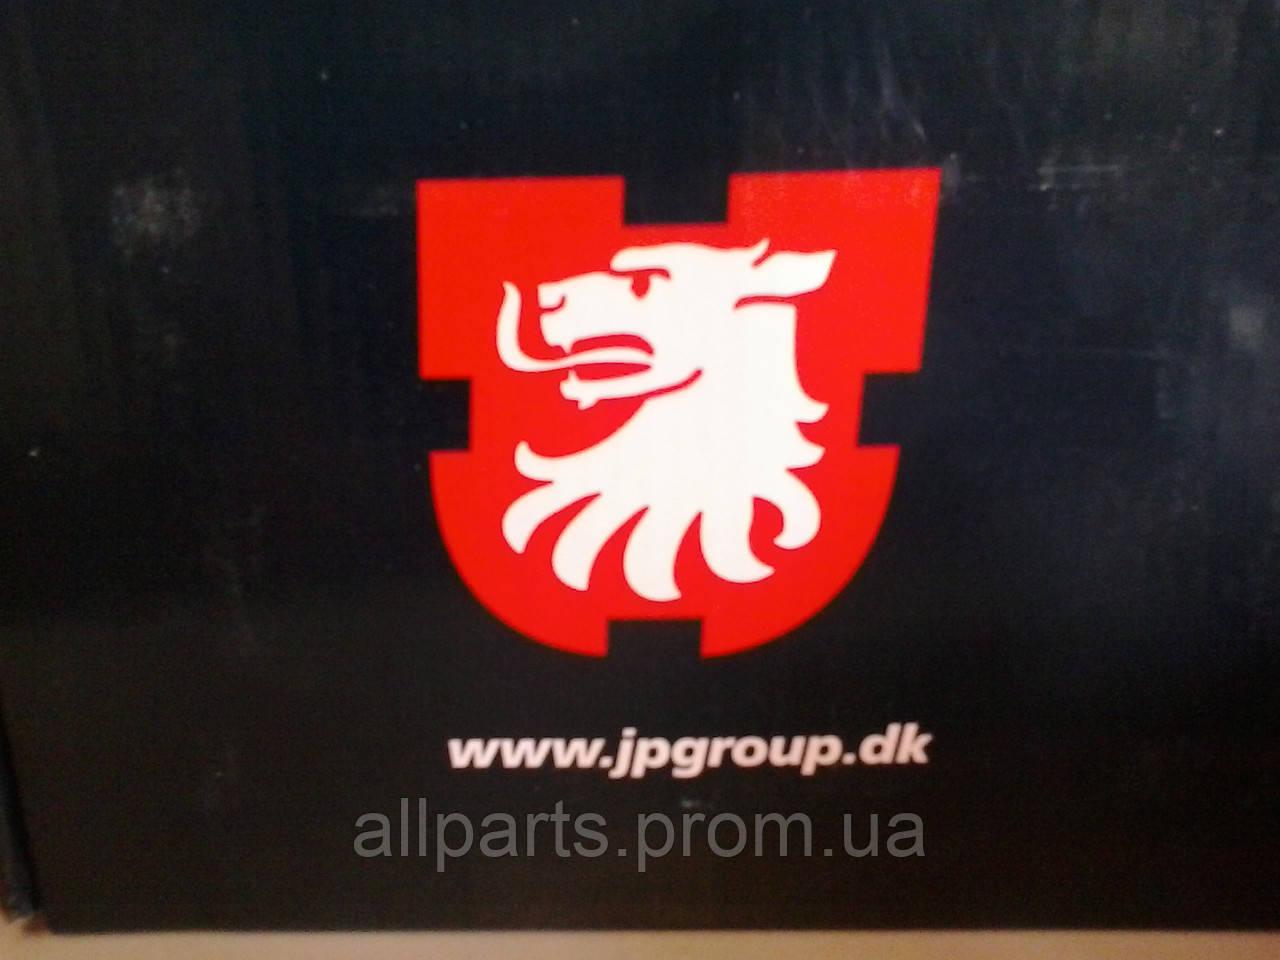 Запчасти производителя JP Group (Дания)